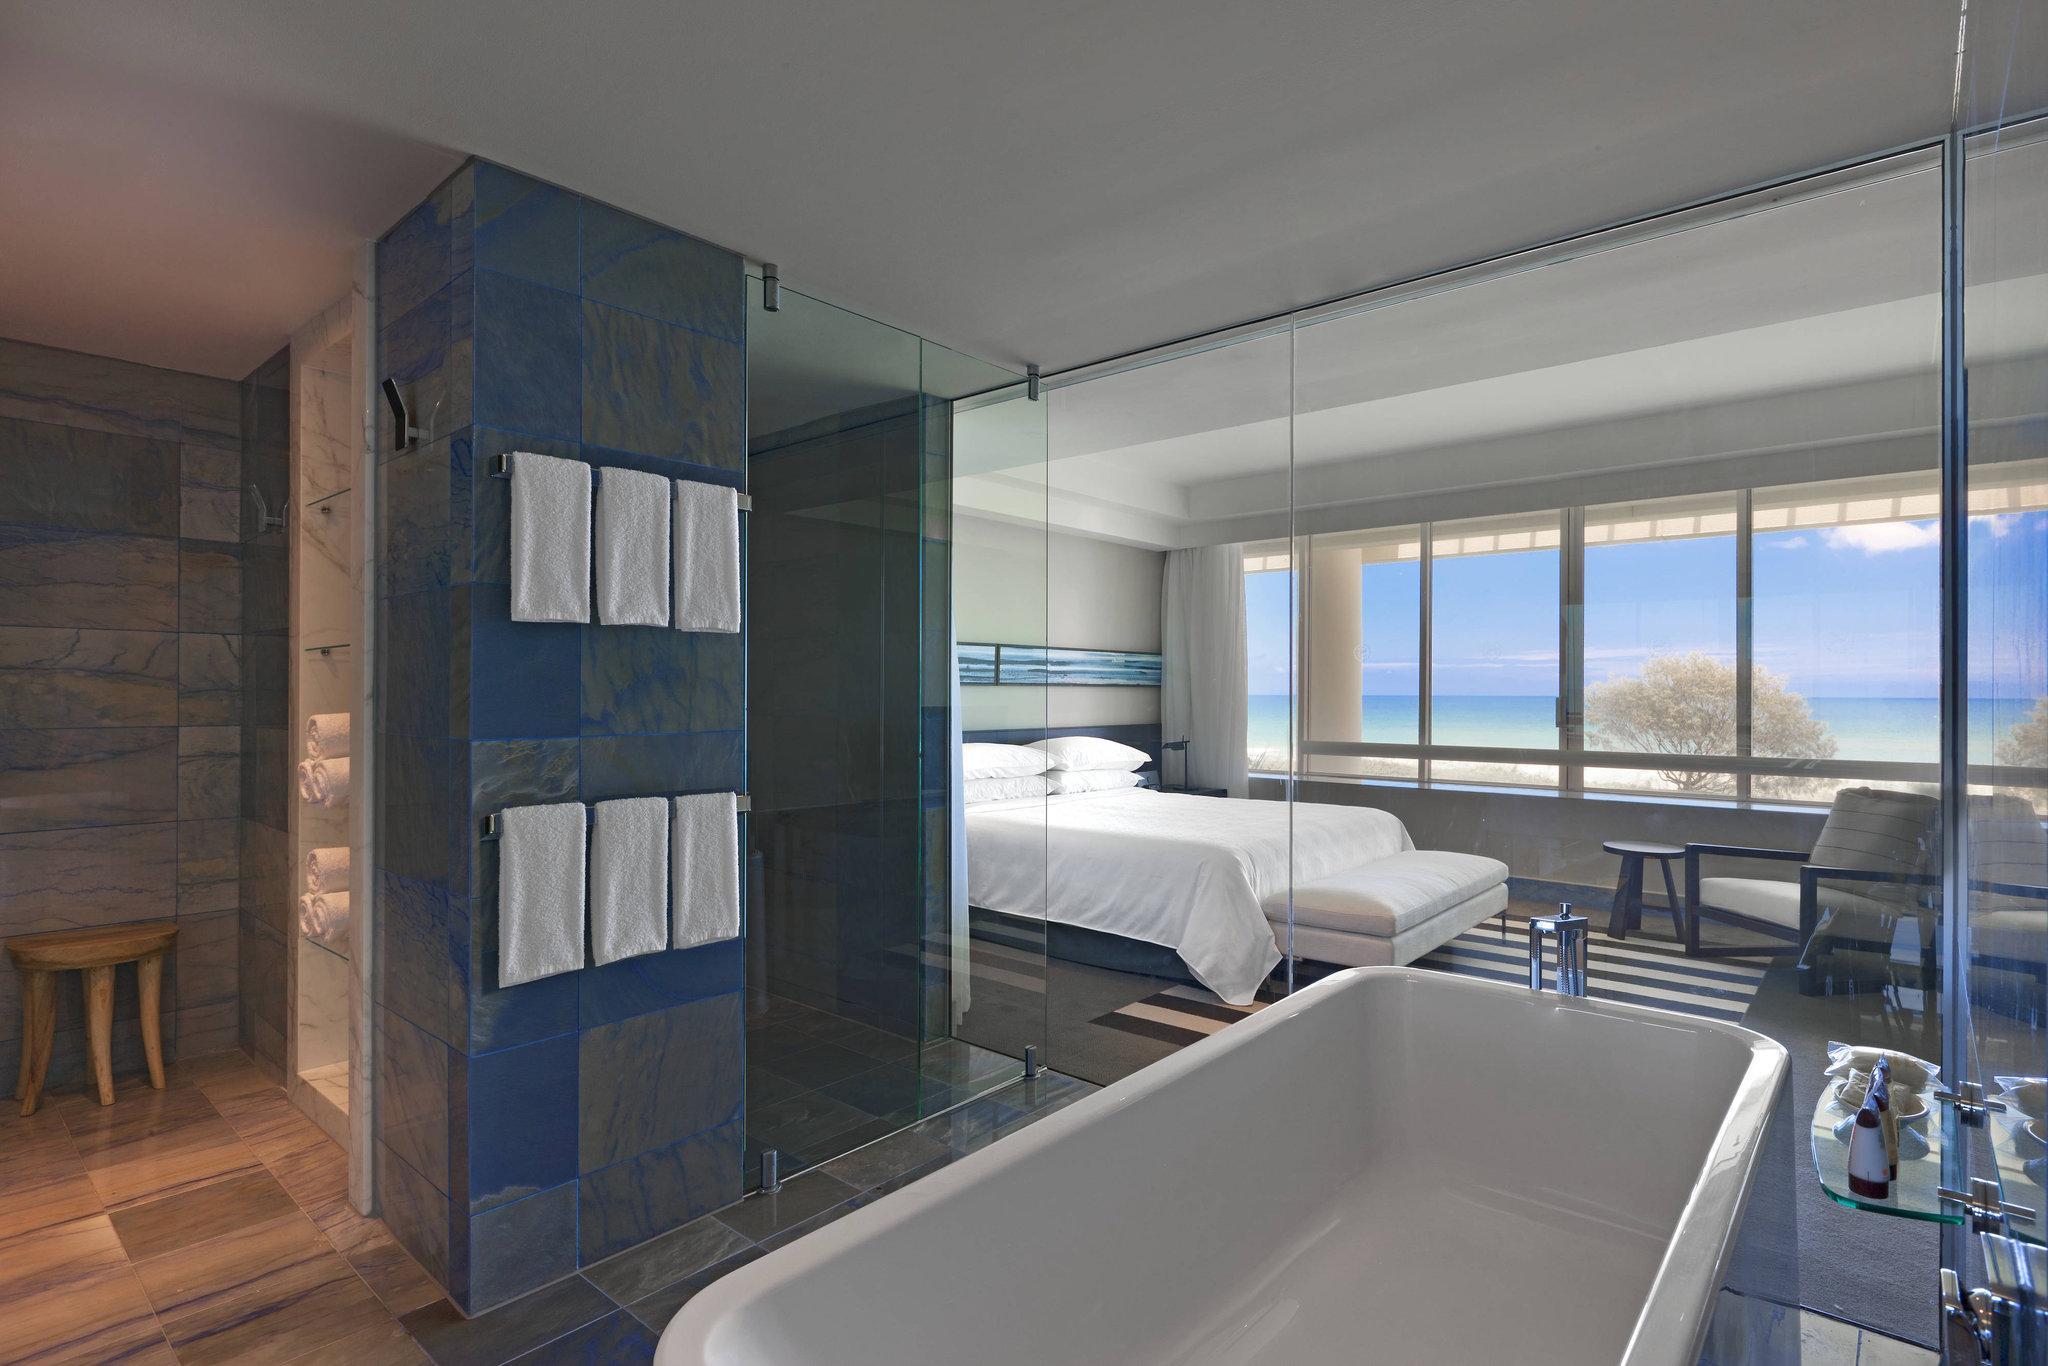 Sheraton Grand Mirage Resort, Gold Coast in Australia - Room